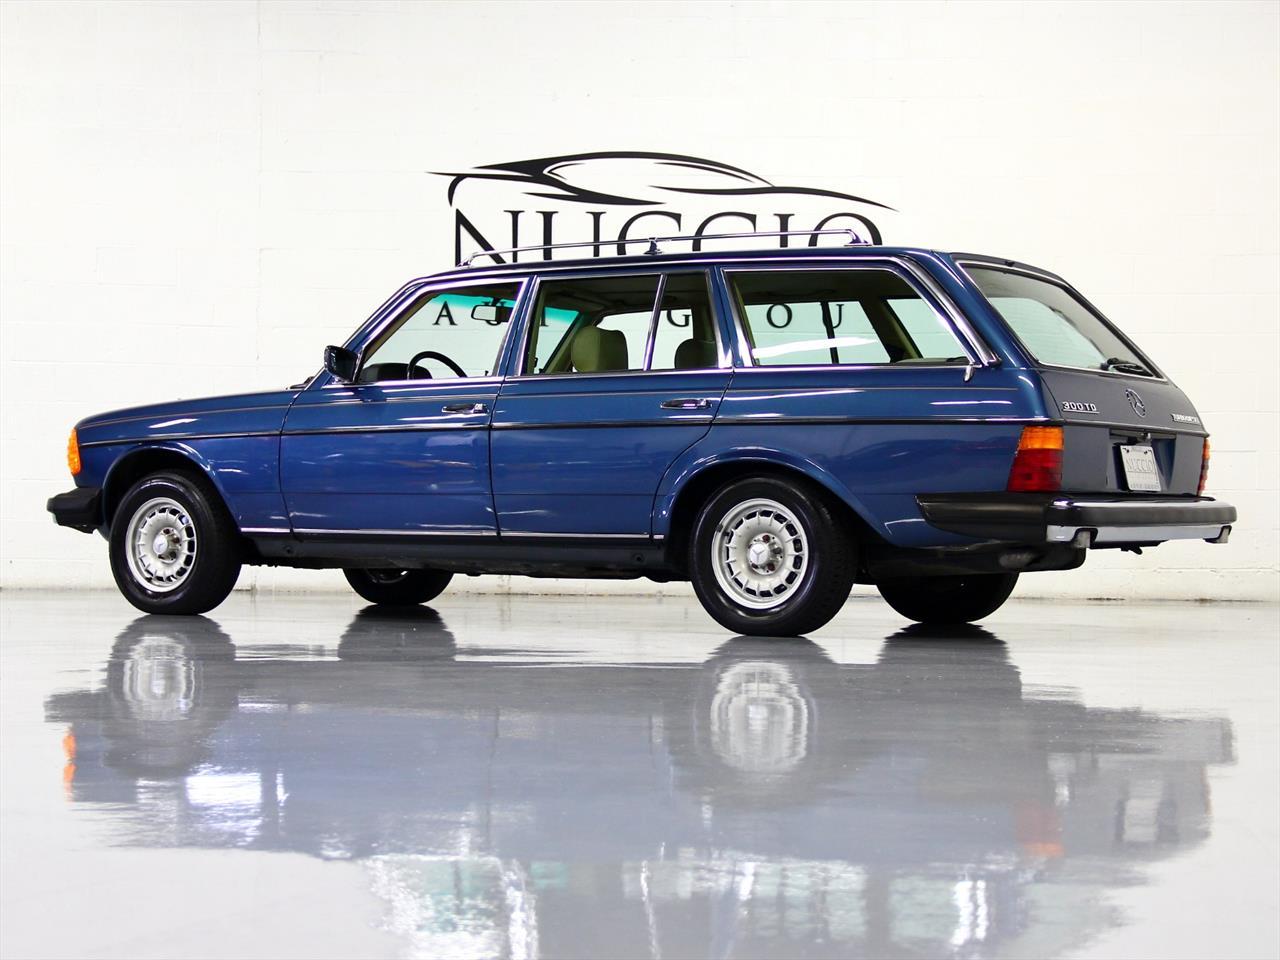 1983 mercedes benz 300td turbo diesel station wagon for Mercedes benz station wagon